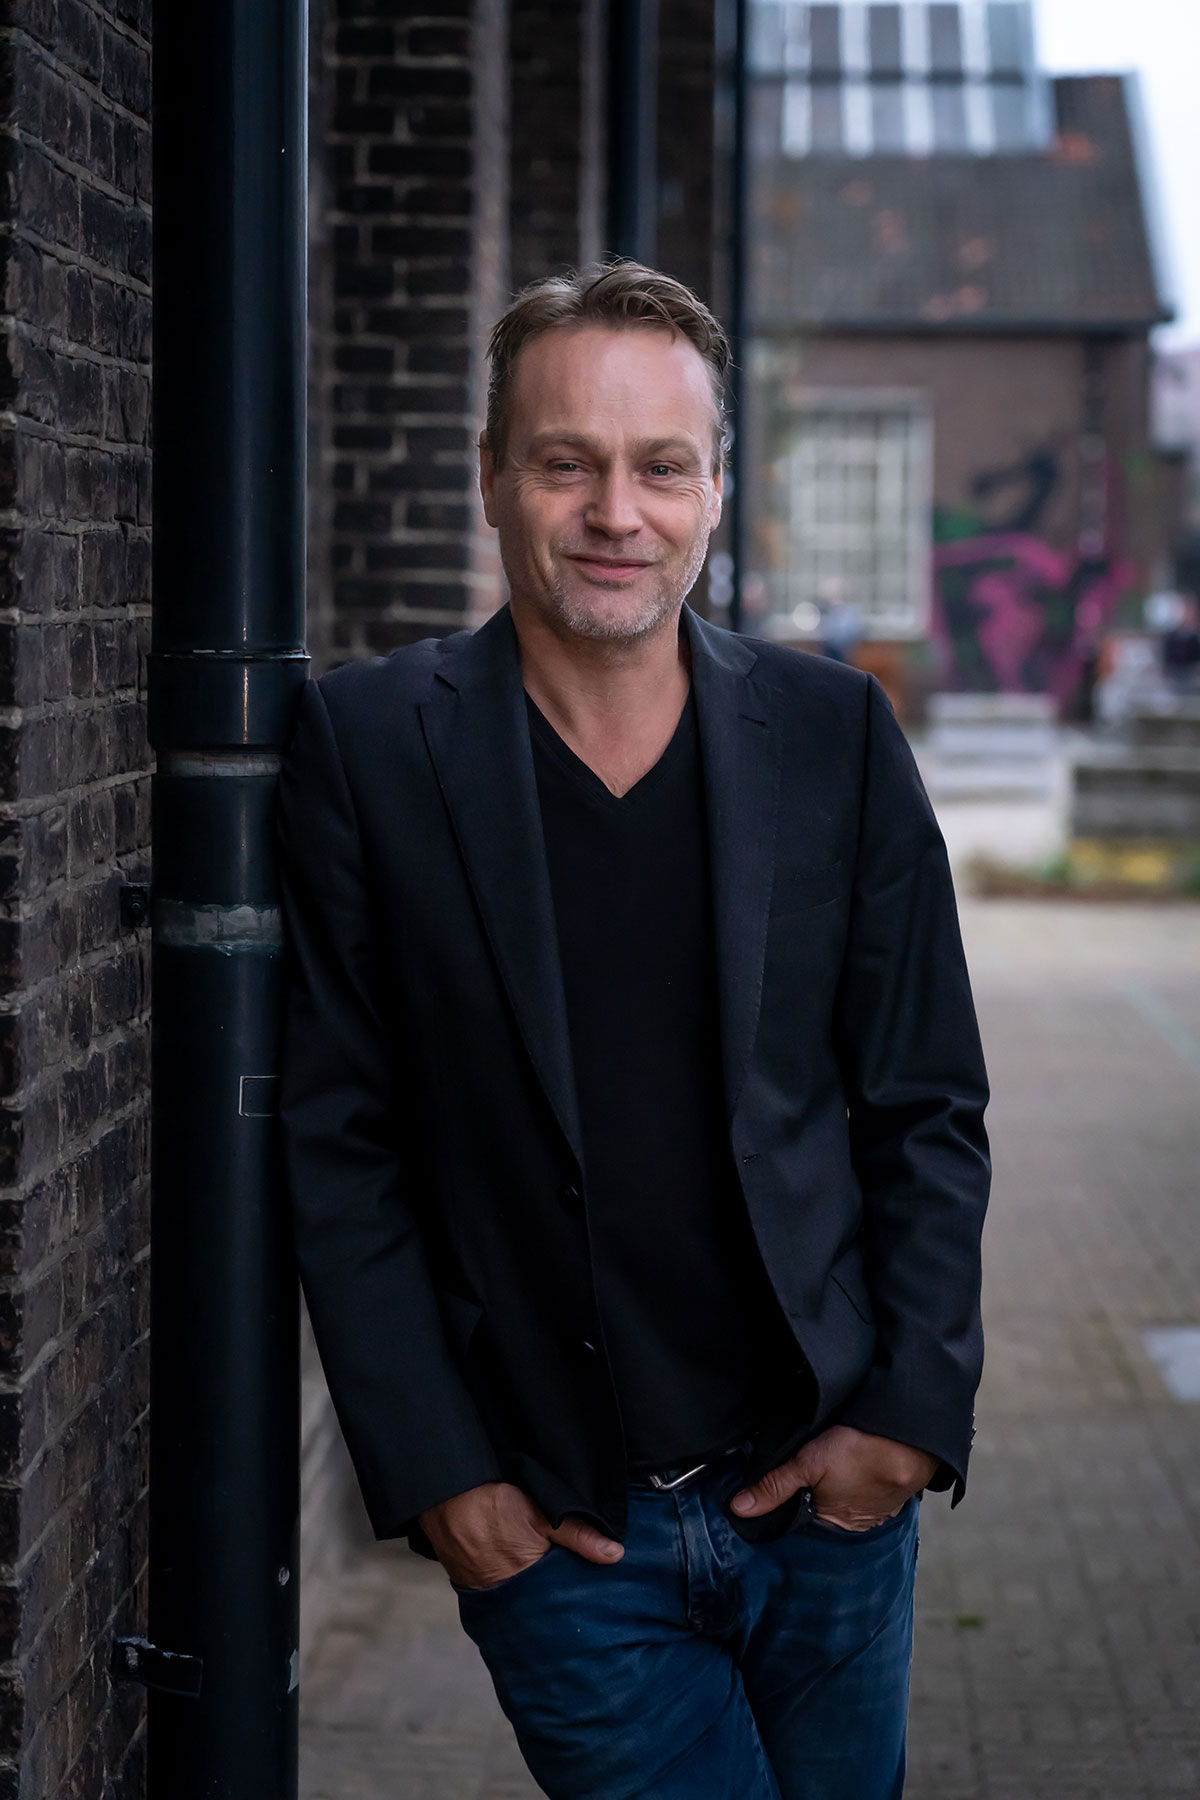 Paul van Liempd